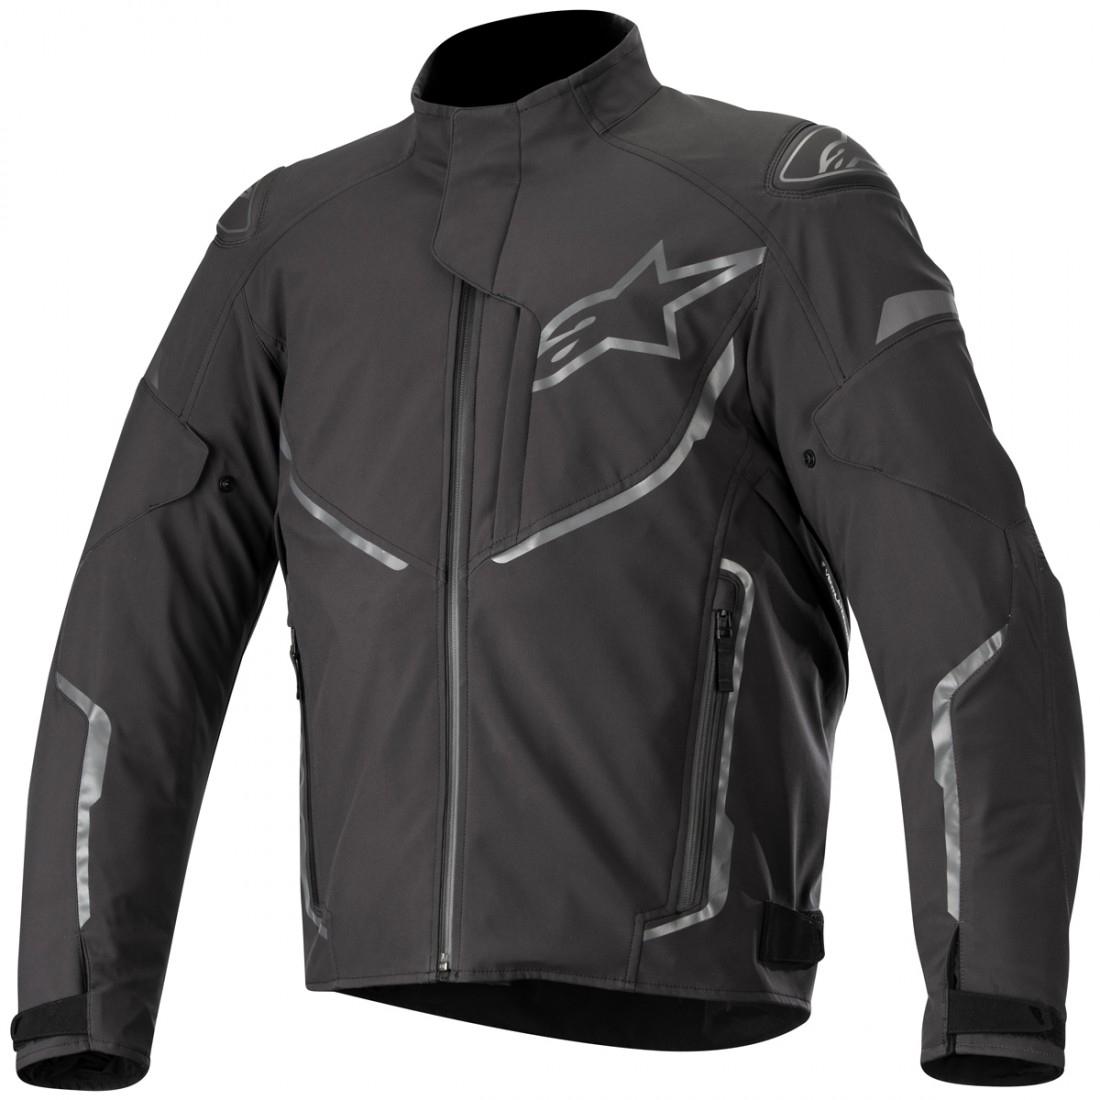 Alpinestars Motorcycle Jacket >> Alpinestars T Fuse Sport Waterproof Anthracite Jacket Motocard